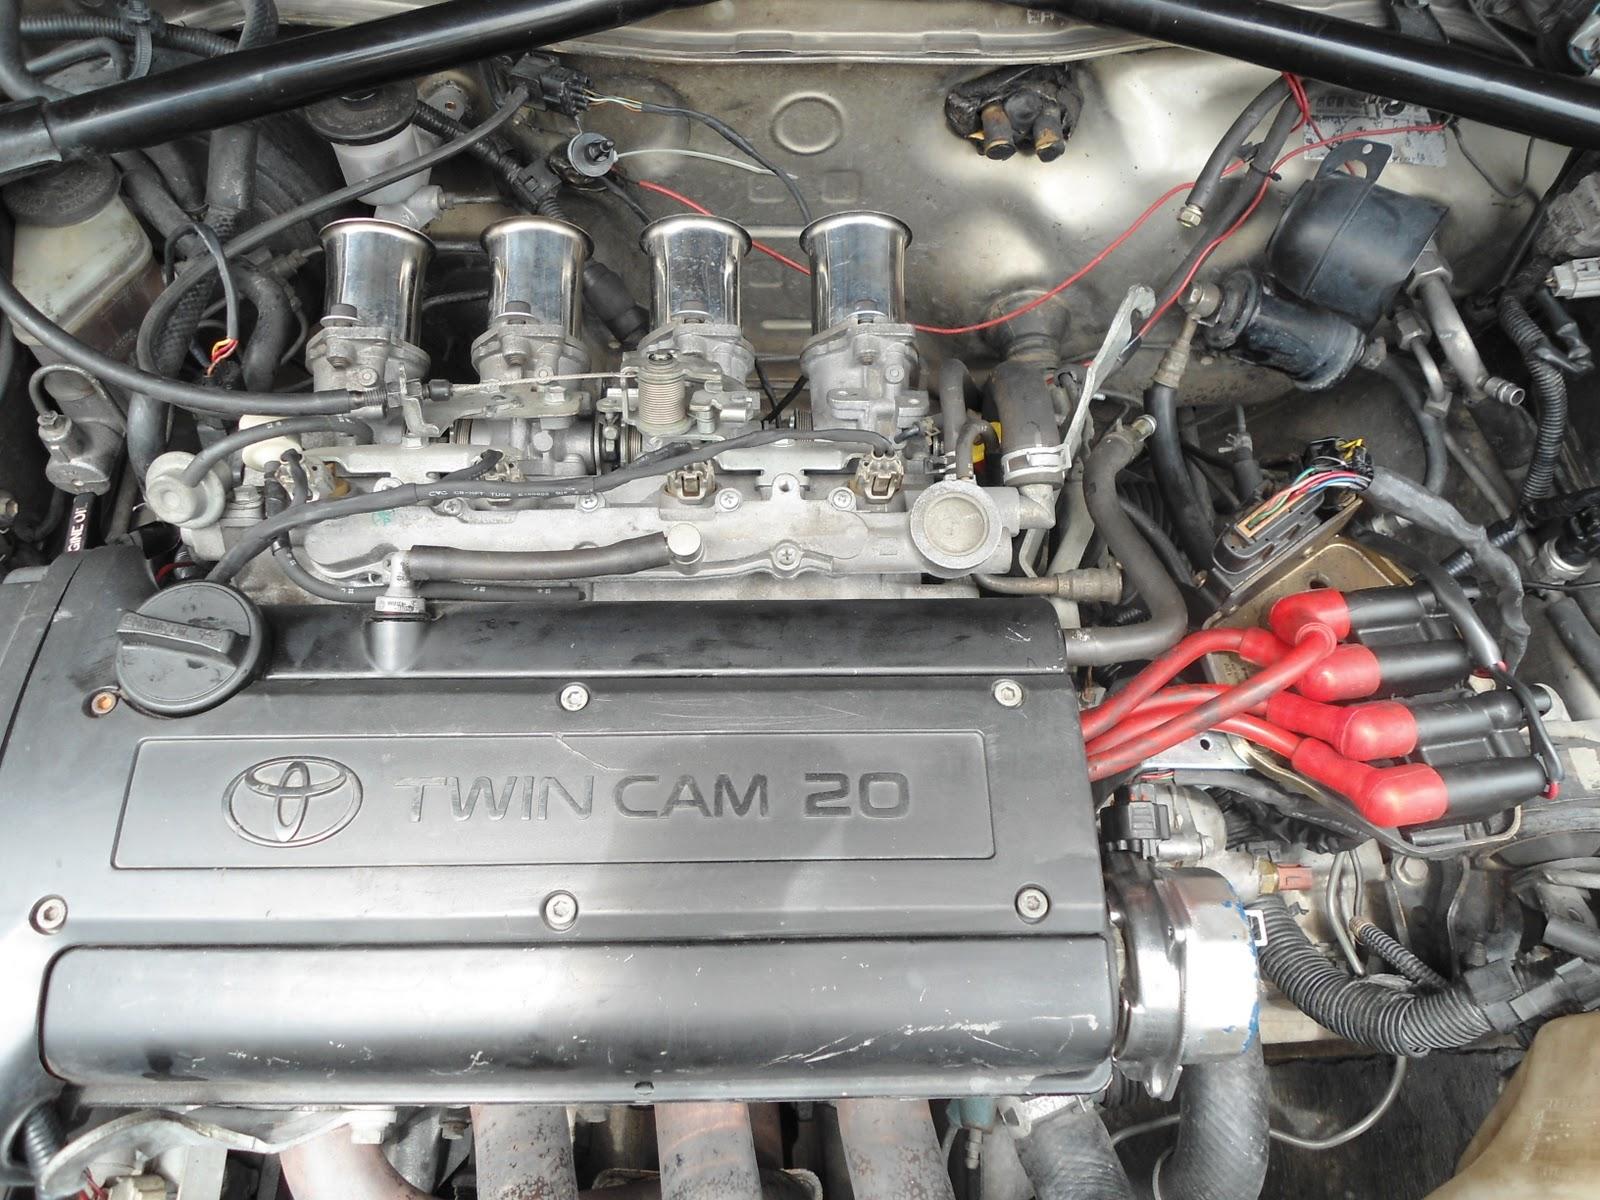 4age 20v Distributor Wiring Diagram Trailer Light Australia R N Autosport Vehicle And Engine Management